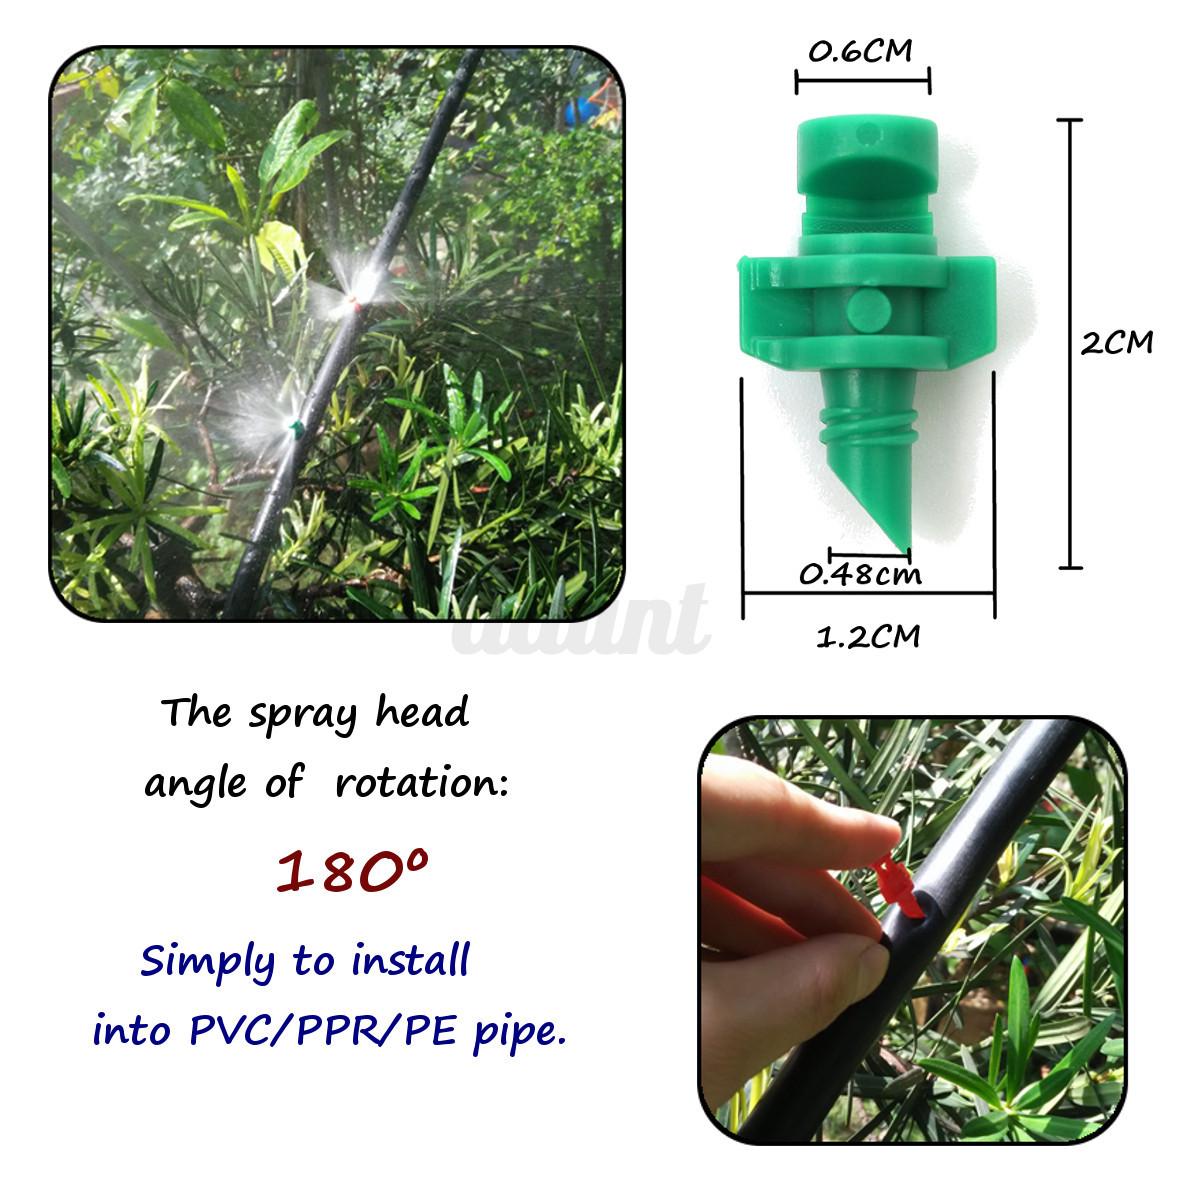 Micro garden lawn water spray misting nozzle sprinkler